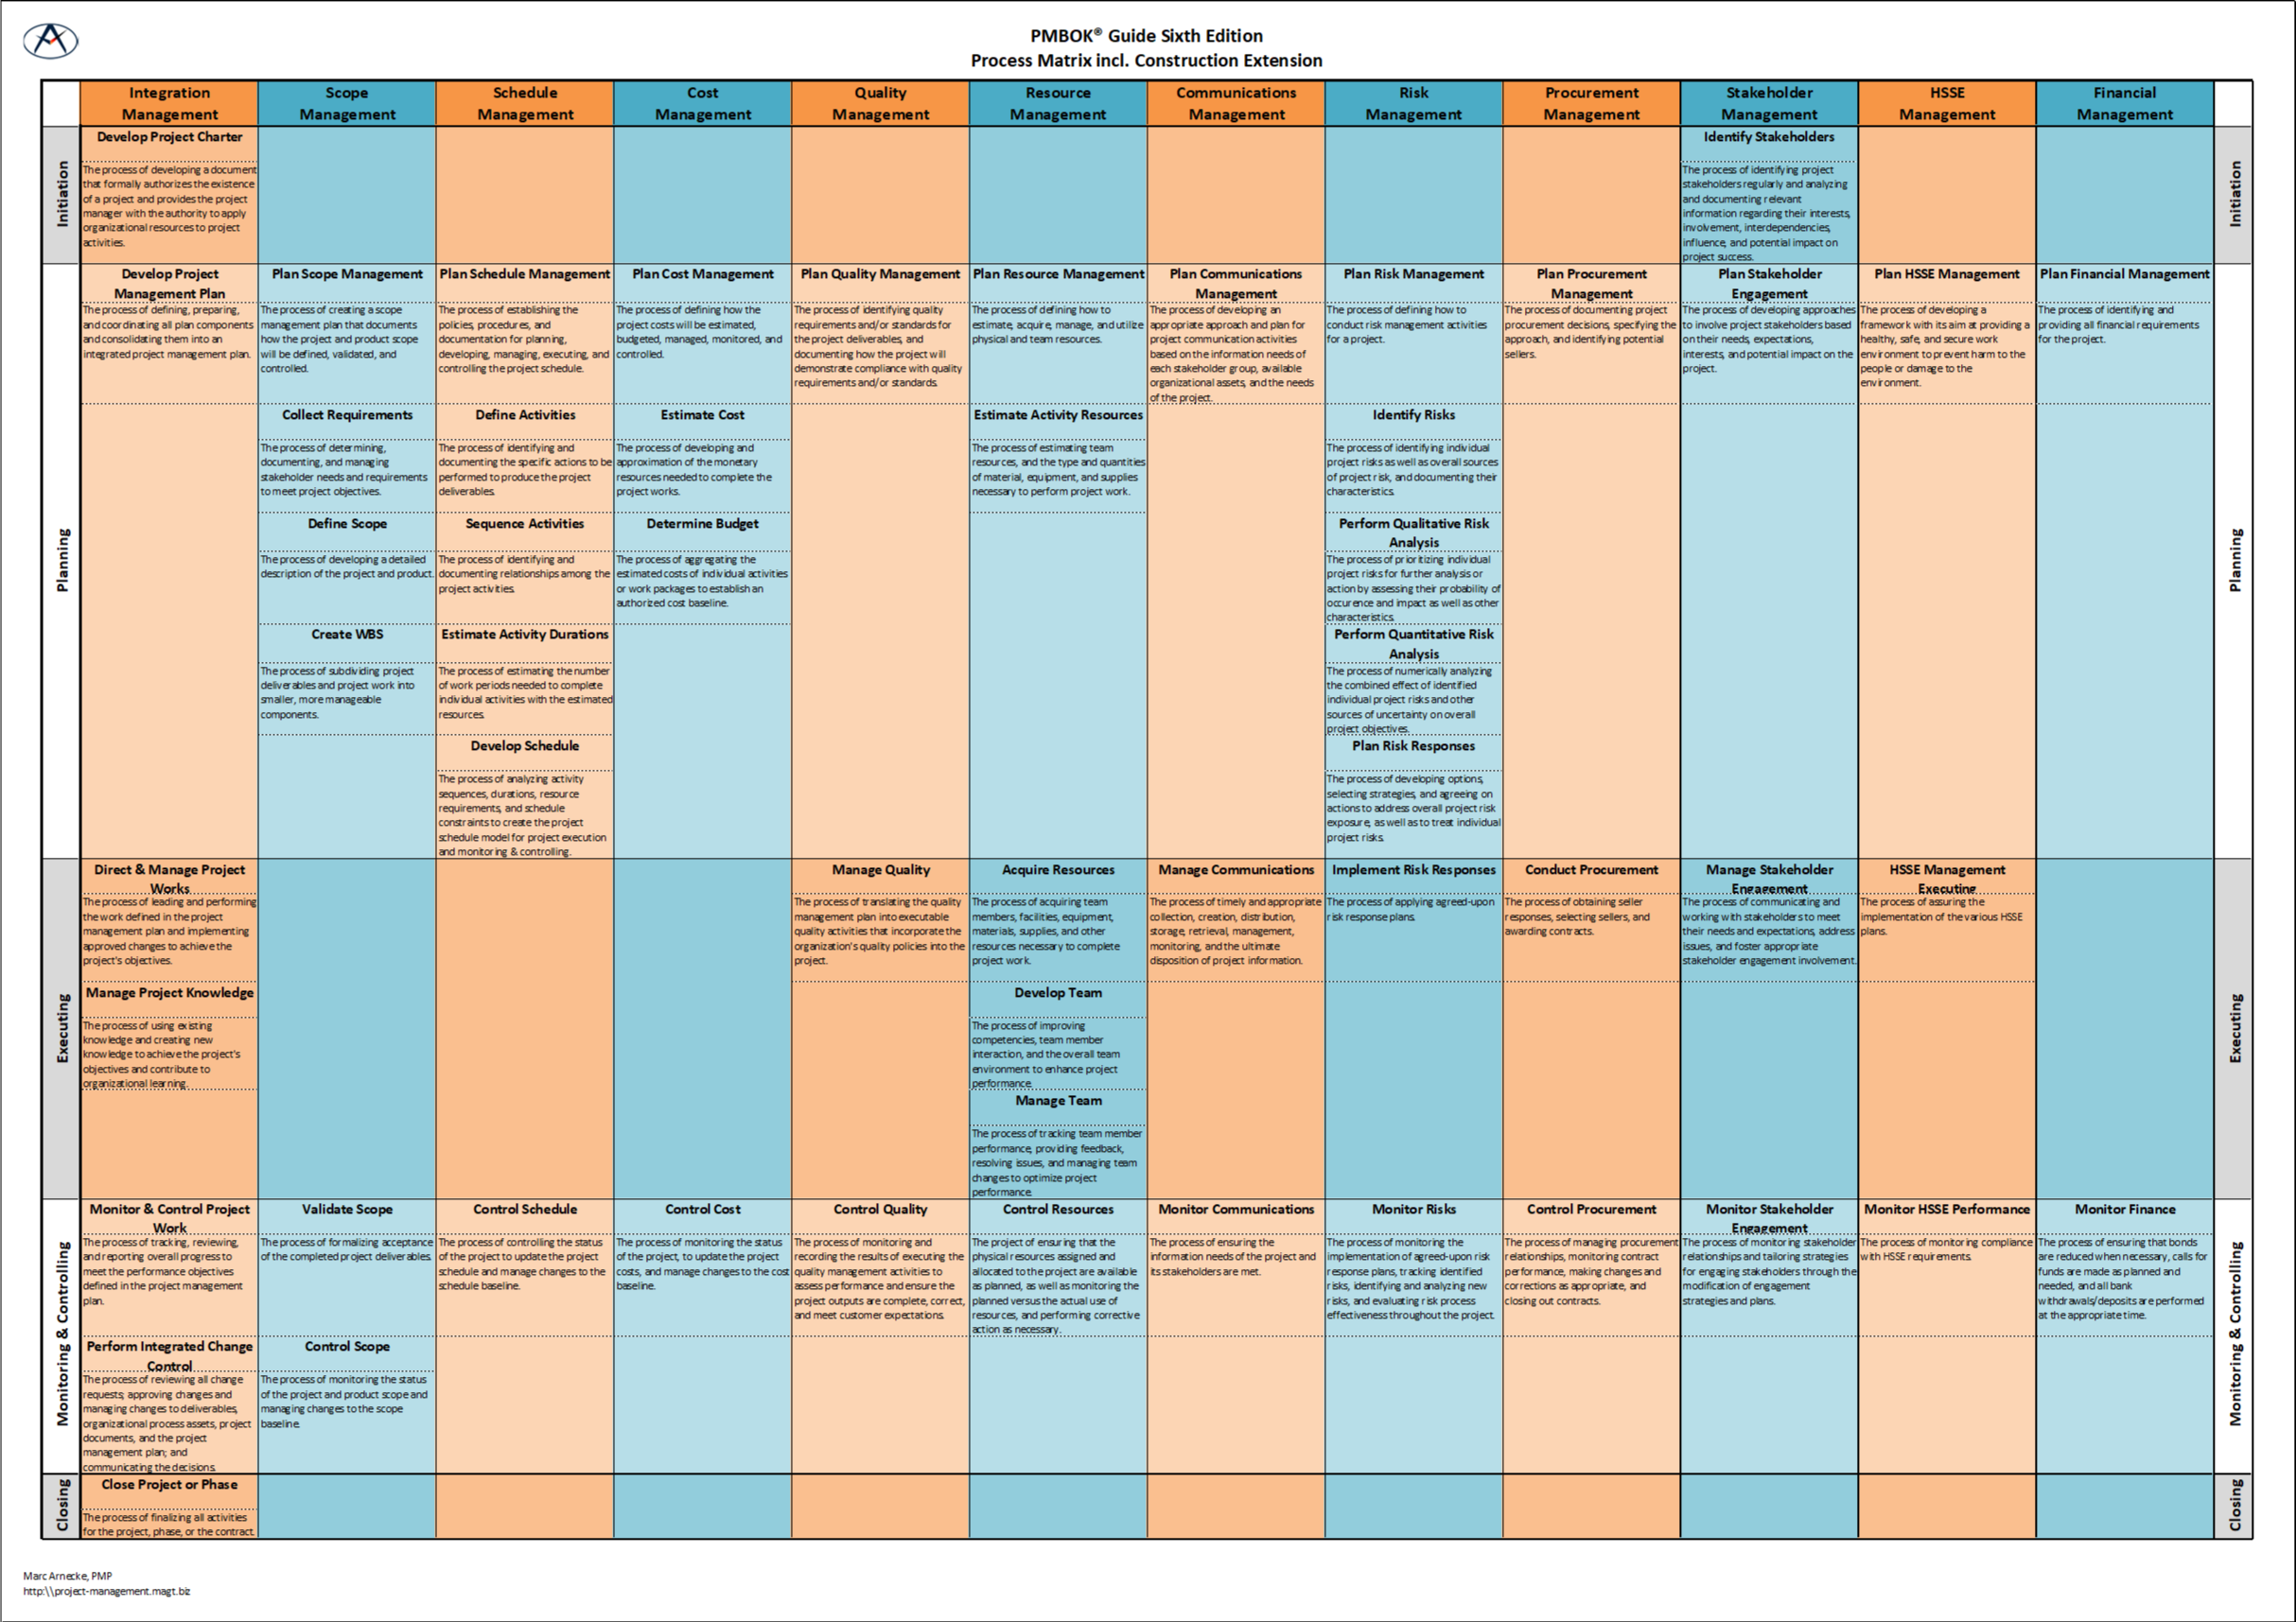 Implementation of Project Management Processes